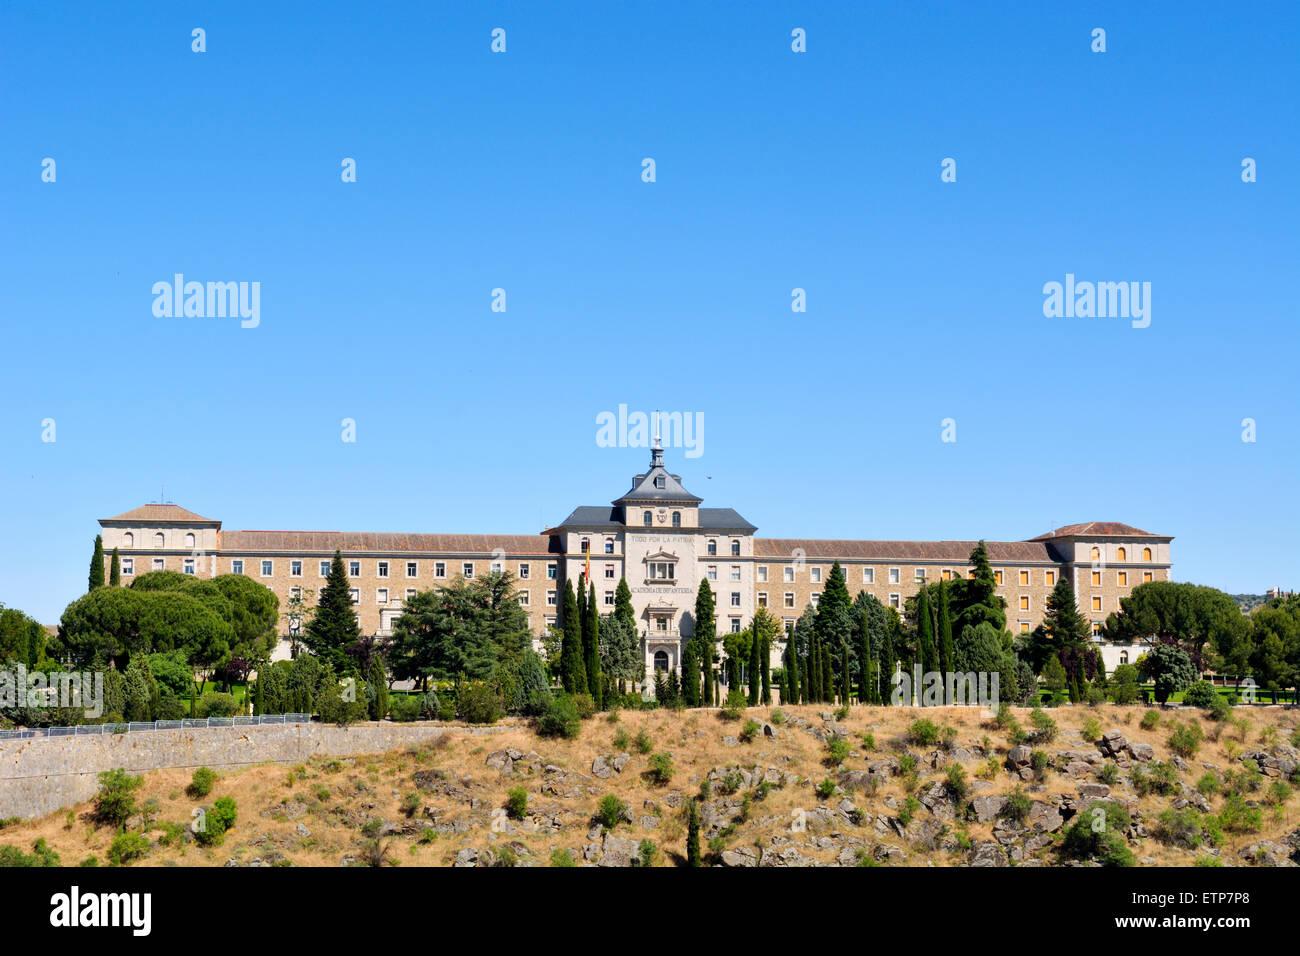 Academia de Infanteria on San Blas hill, Toledo, Spain - Stock Image